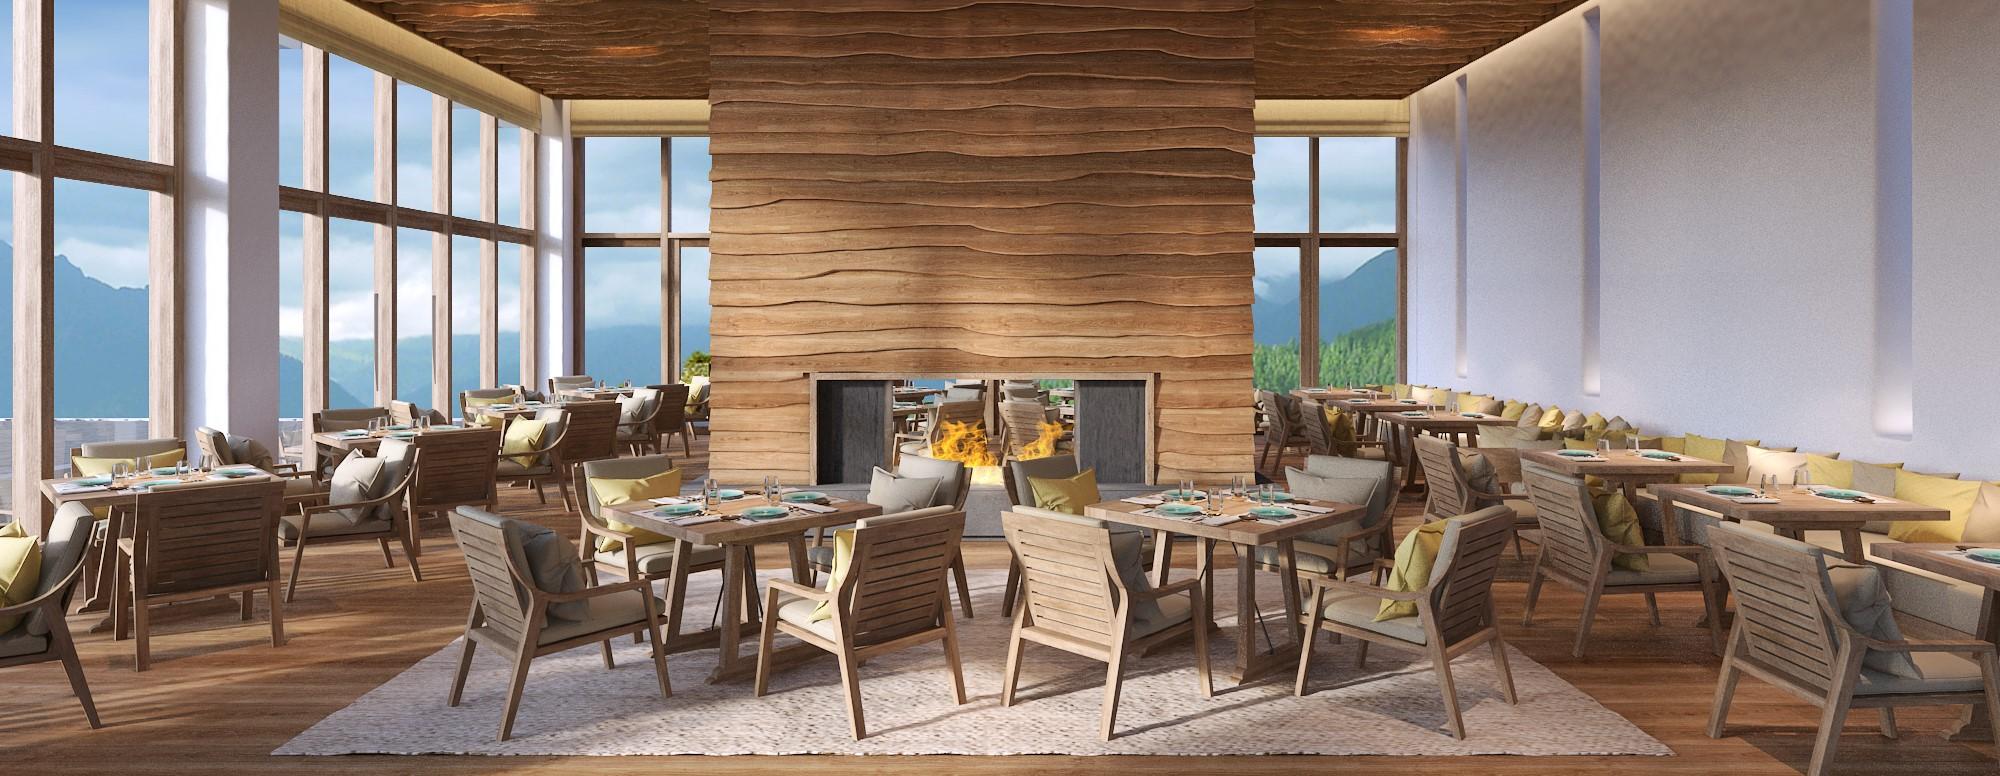 Six-senses-Thimphu-Dining-room